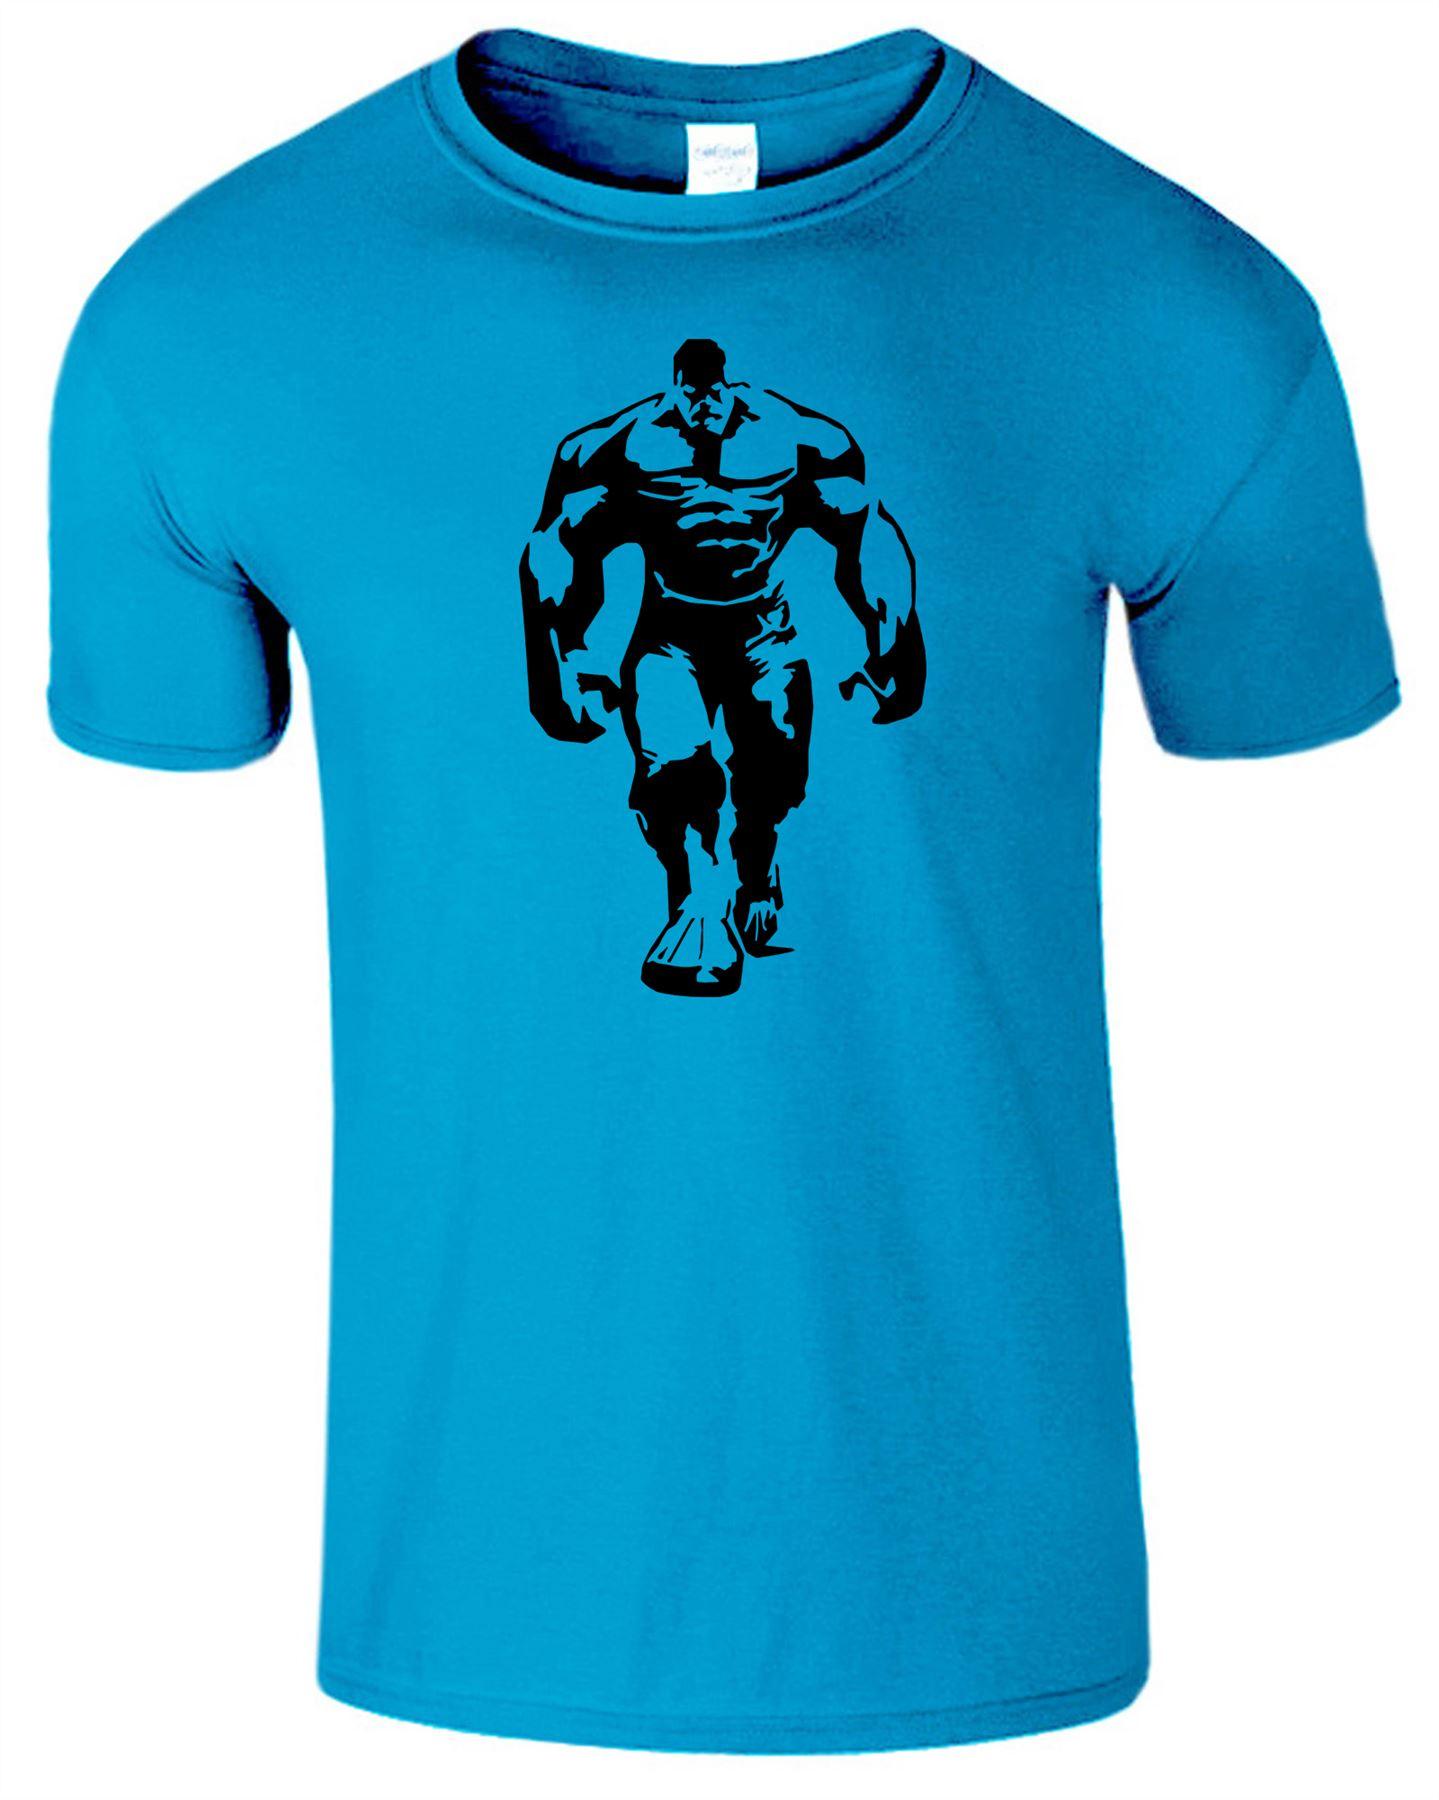 1439x1800 Hulk Silhouette Mens T Shirt Gym Bodybuilding Fitness Training